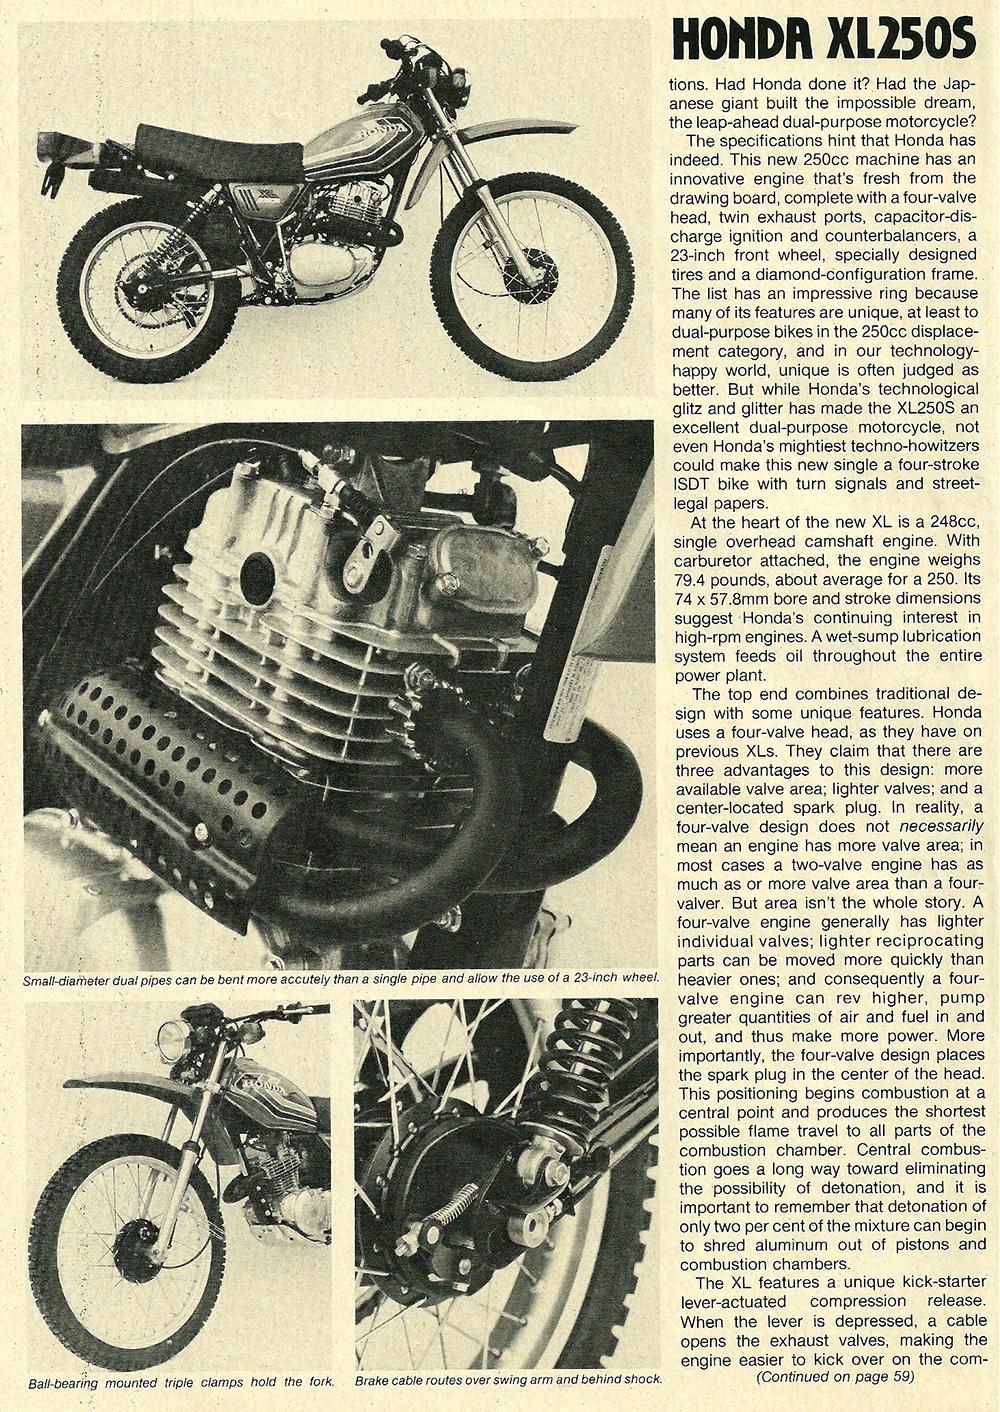 1978 Honda XL250S road test 03.jpg